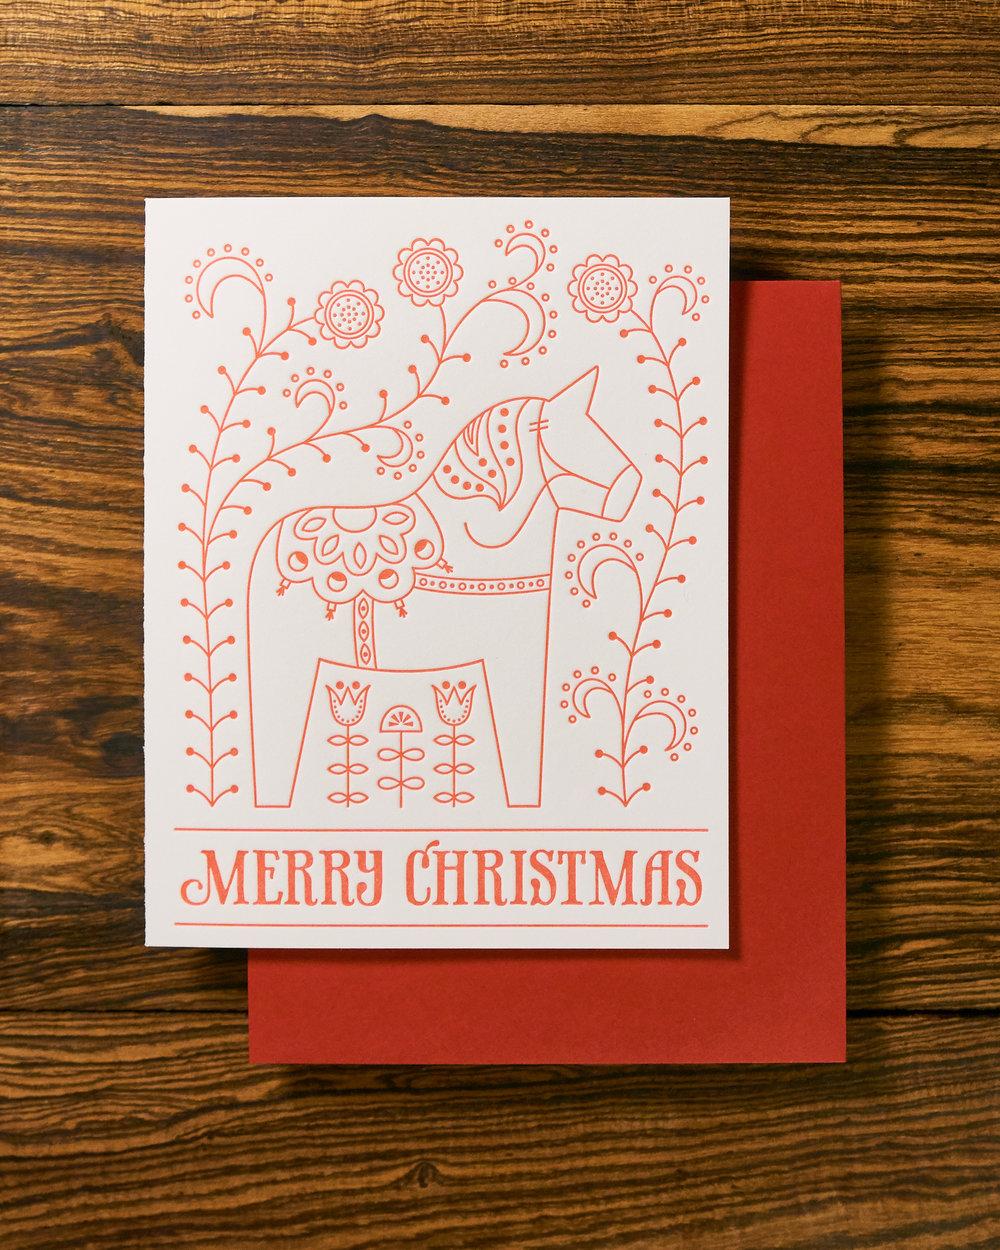 Letterpress Christmas Cards.Letterpress Greeting Cards Letterpress Cards Wedding